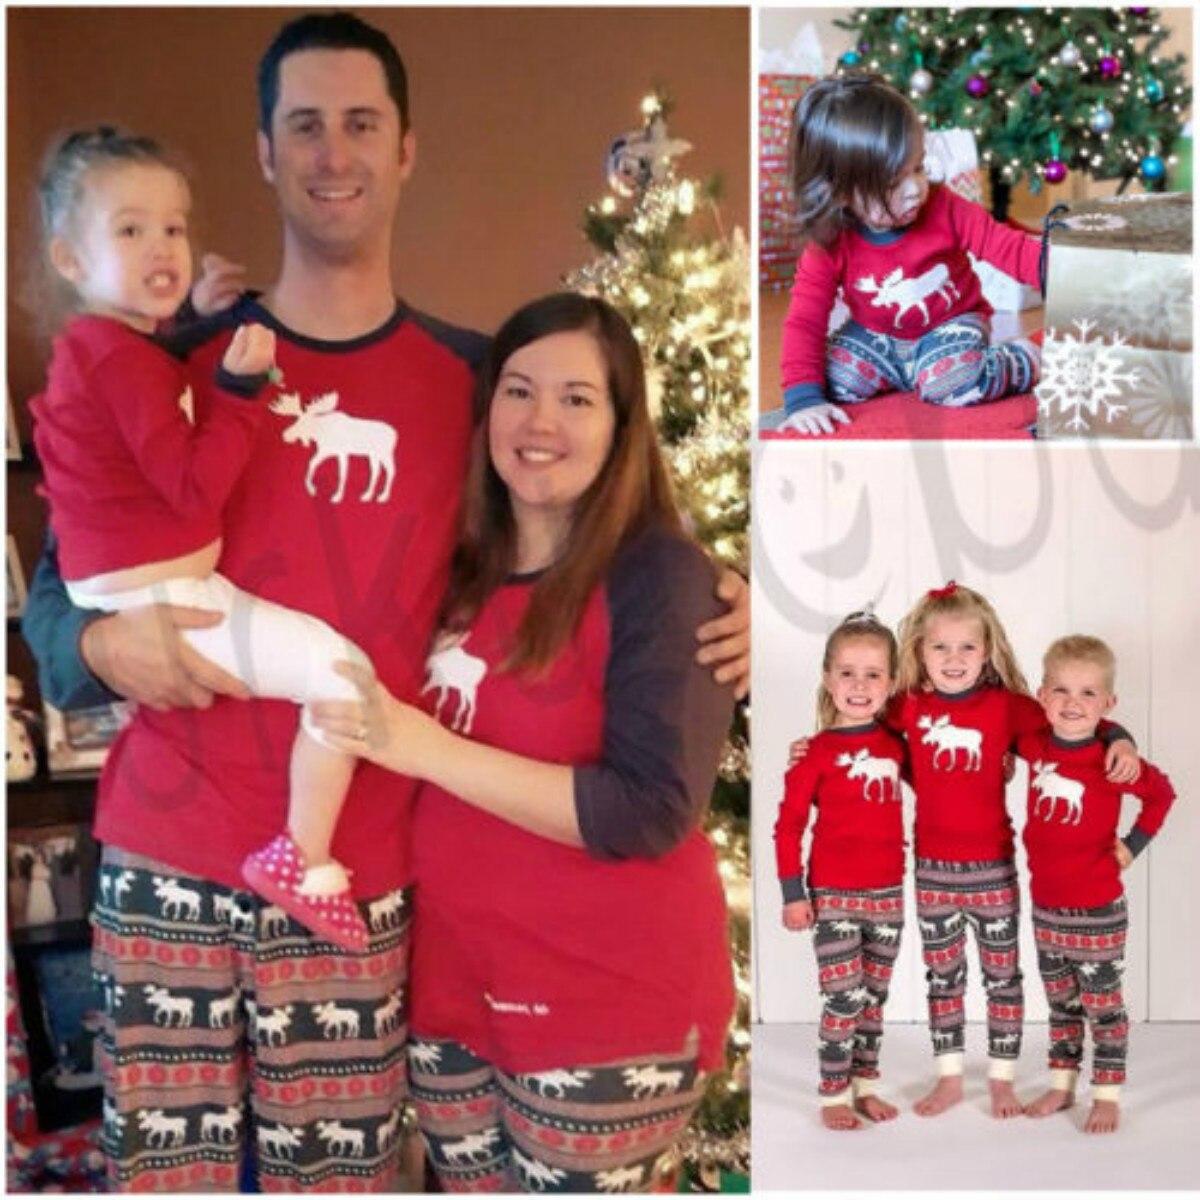 2018 New Brand Newest Family Matching Christmas  Long Sleeve Striped Casual Pajamas  Sets Xmas Sleepwear Nightwear